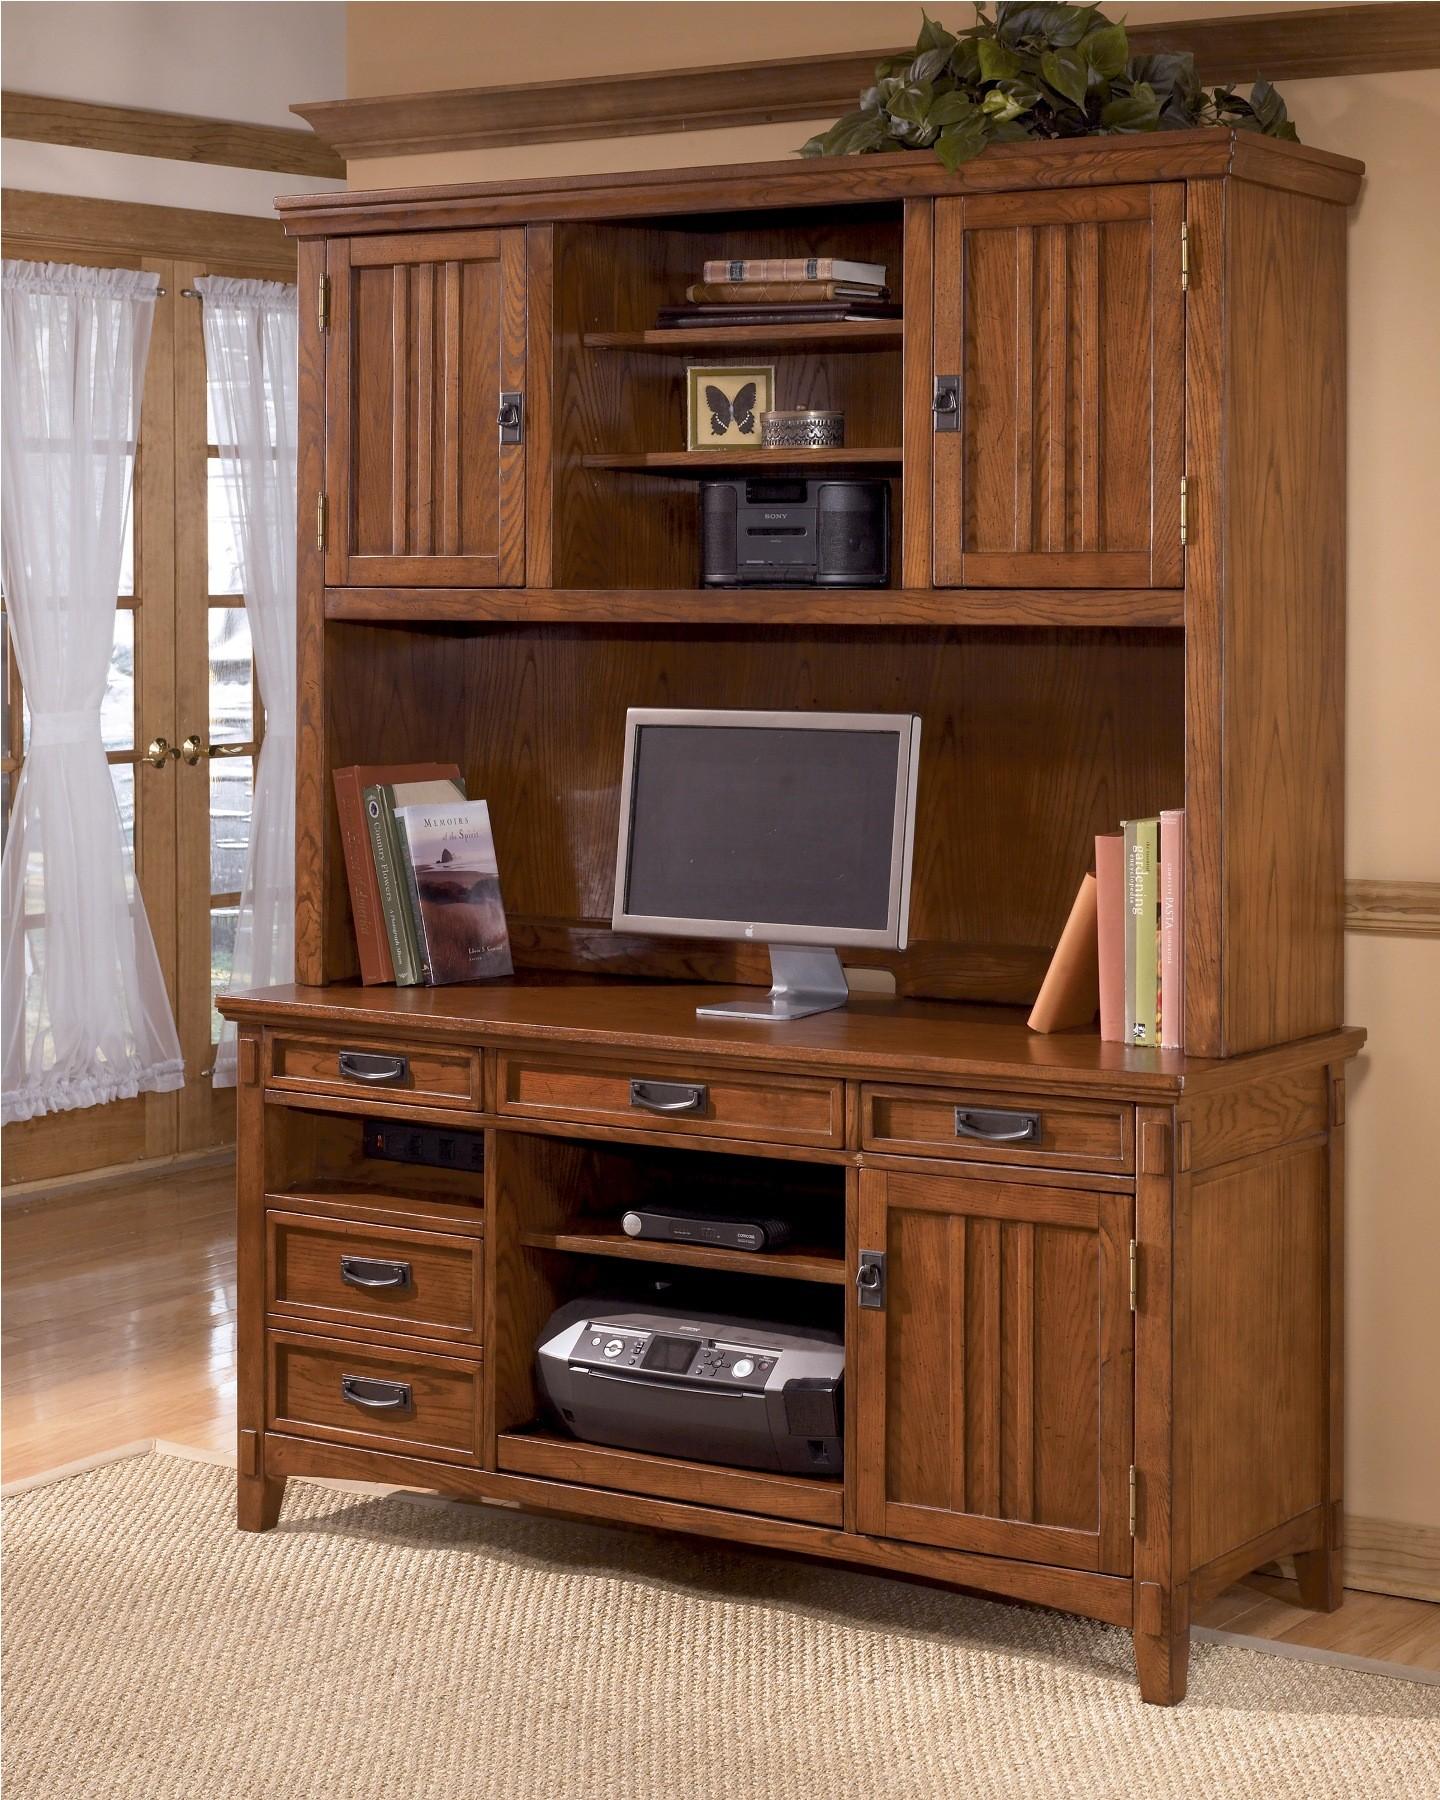 Ashley Furniture Glosco Kitchen Hutch: Cross Island Large Credenza W/ Large Hutch From Ashley